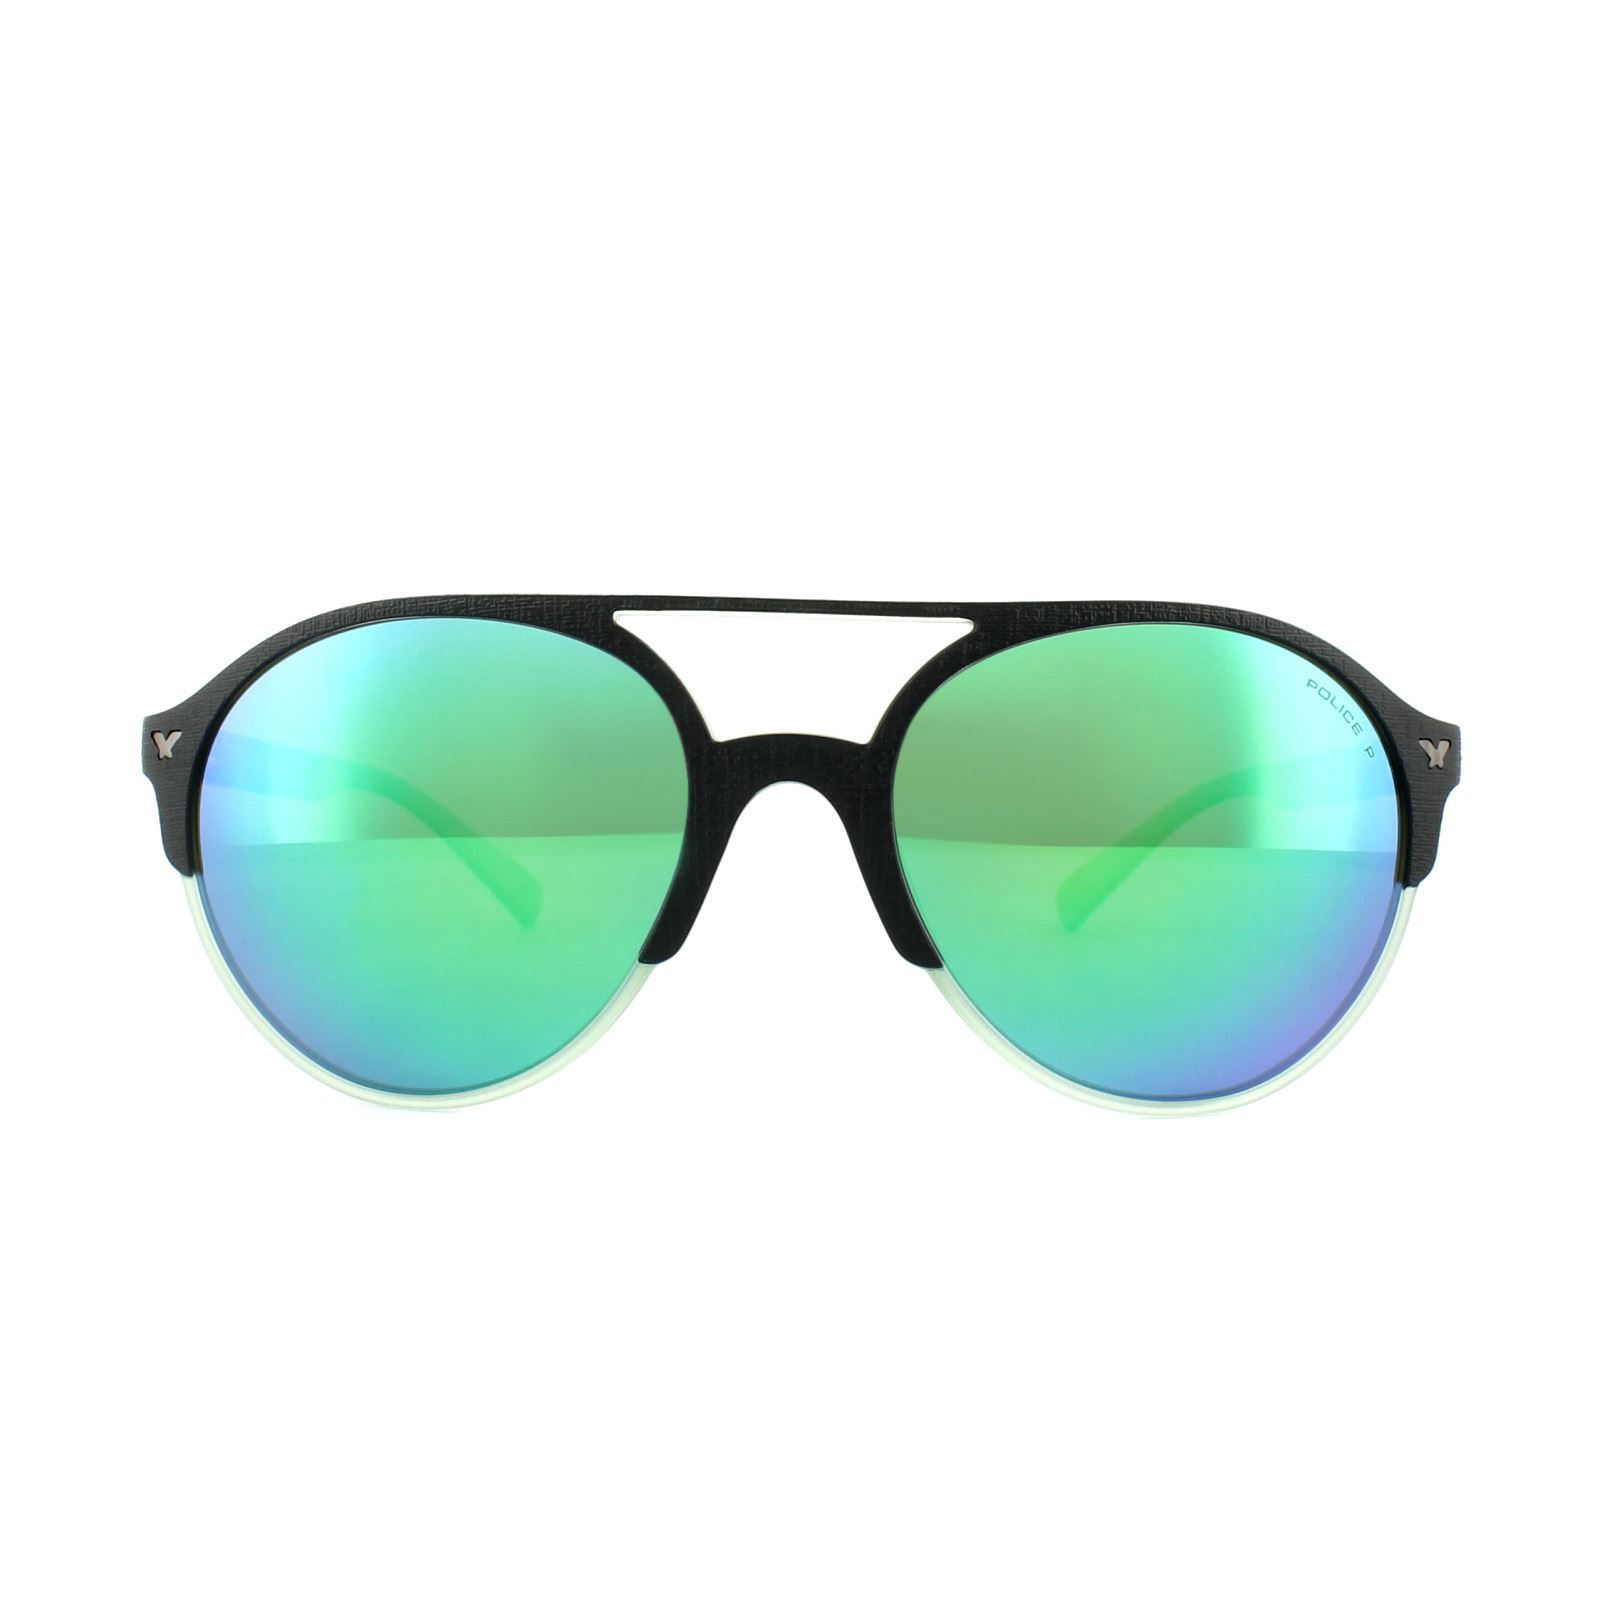 Police Sunglasses Game 7 SPL163 6PCV Matt Black Cream Green Blue Green Mirror